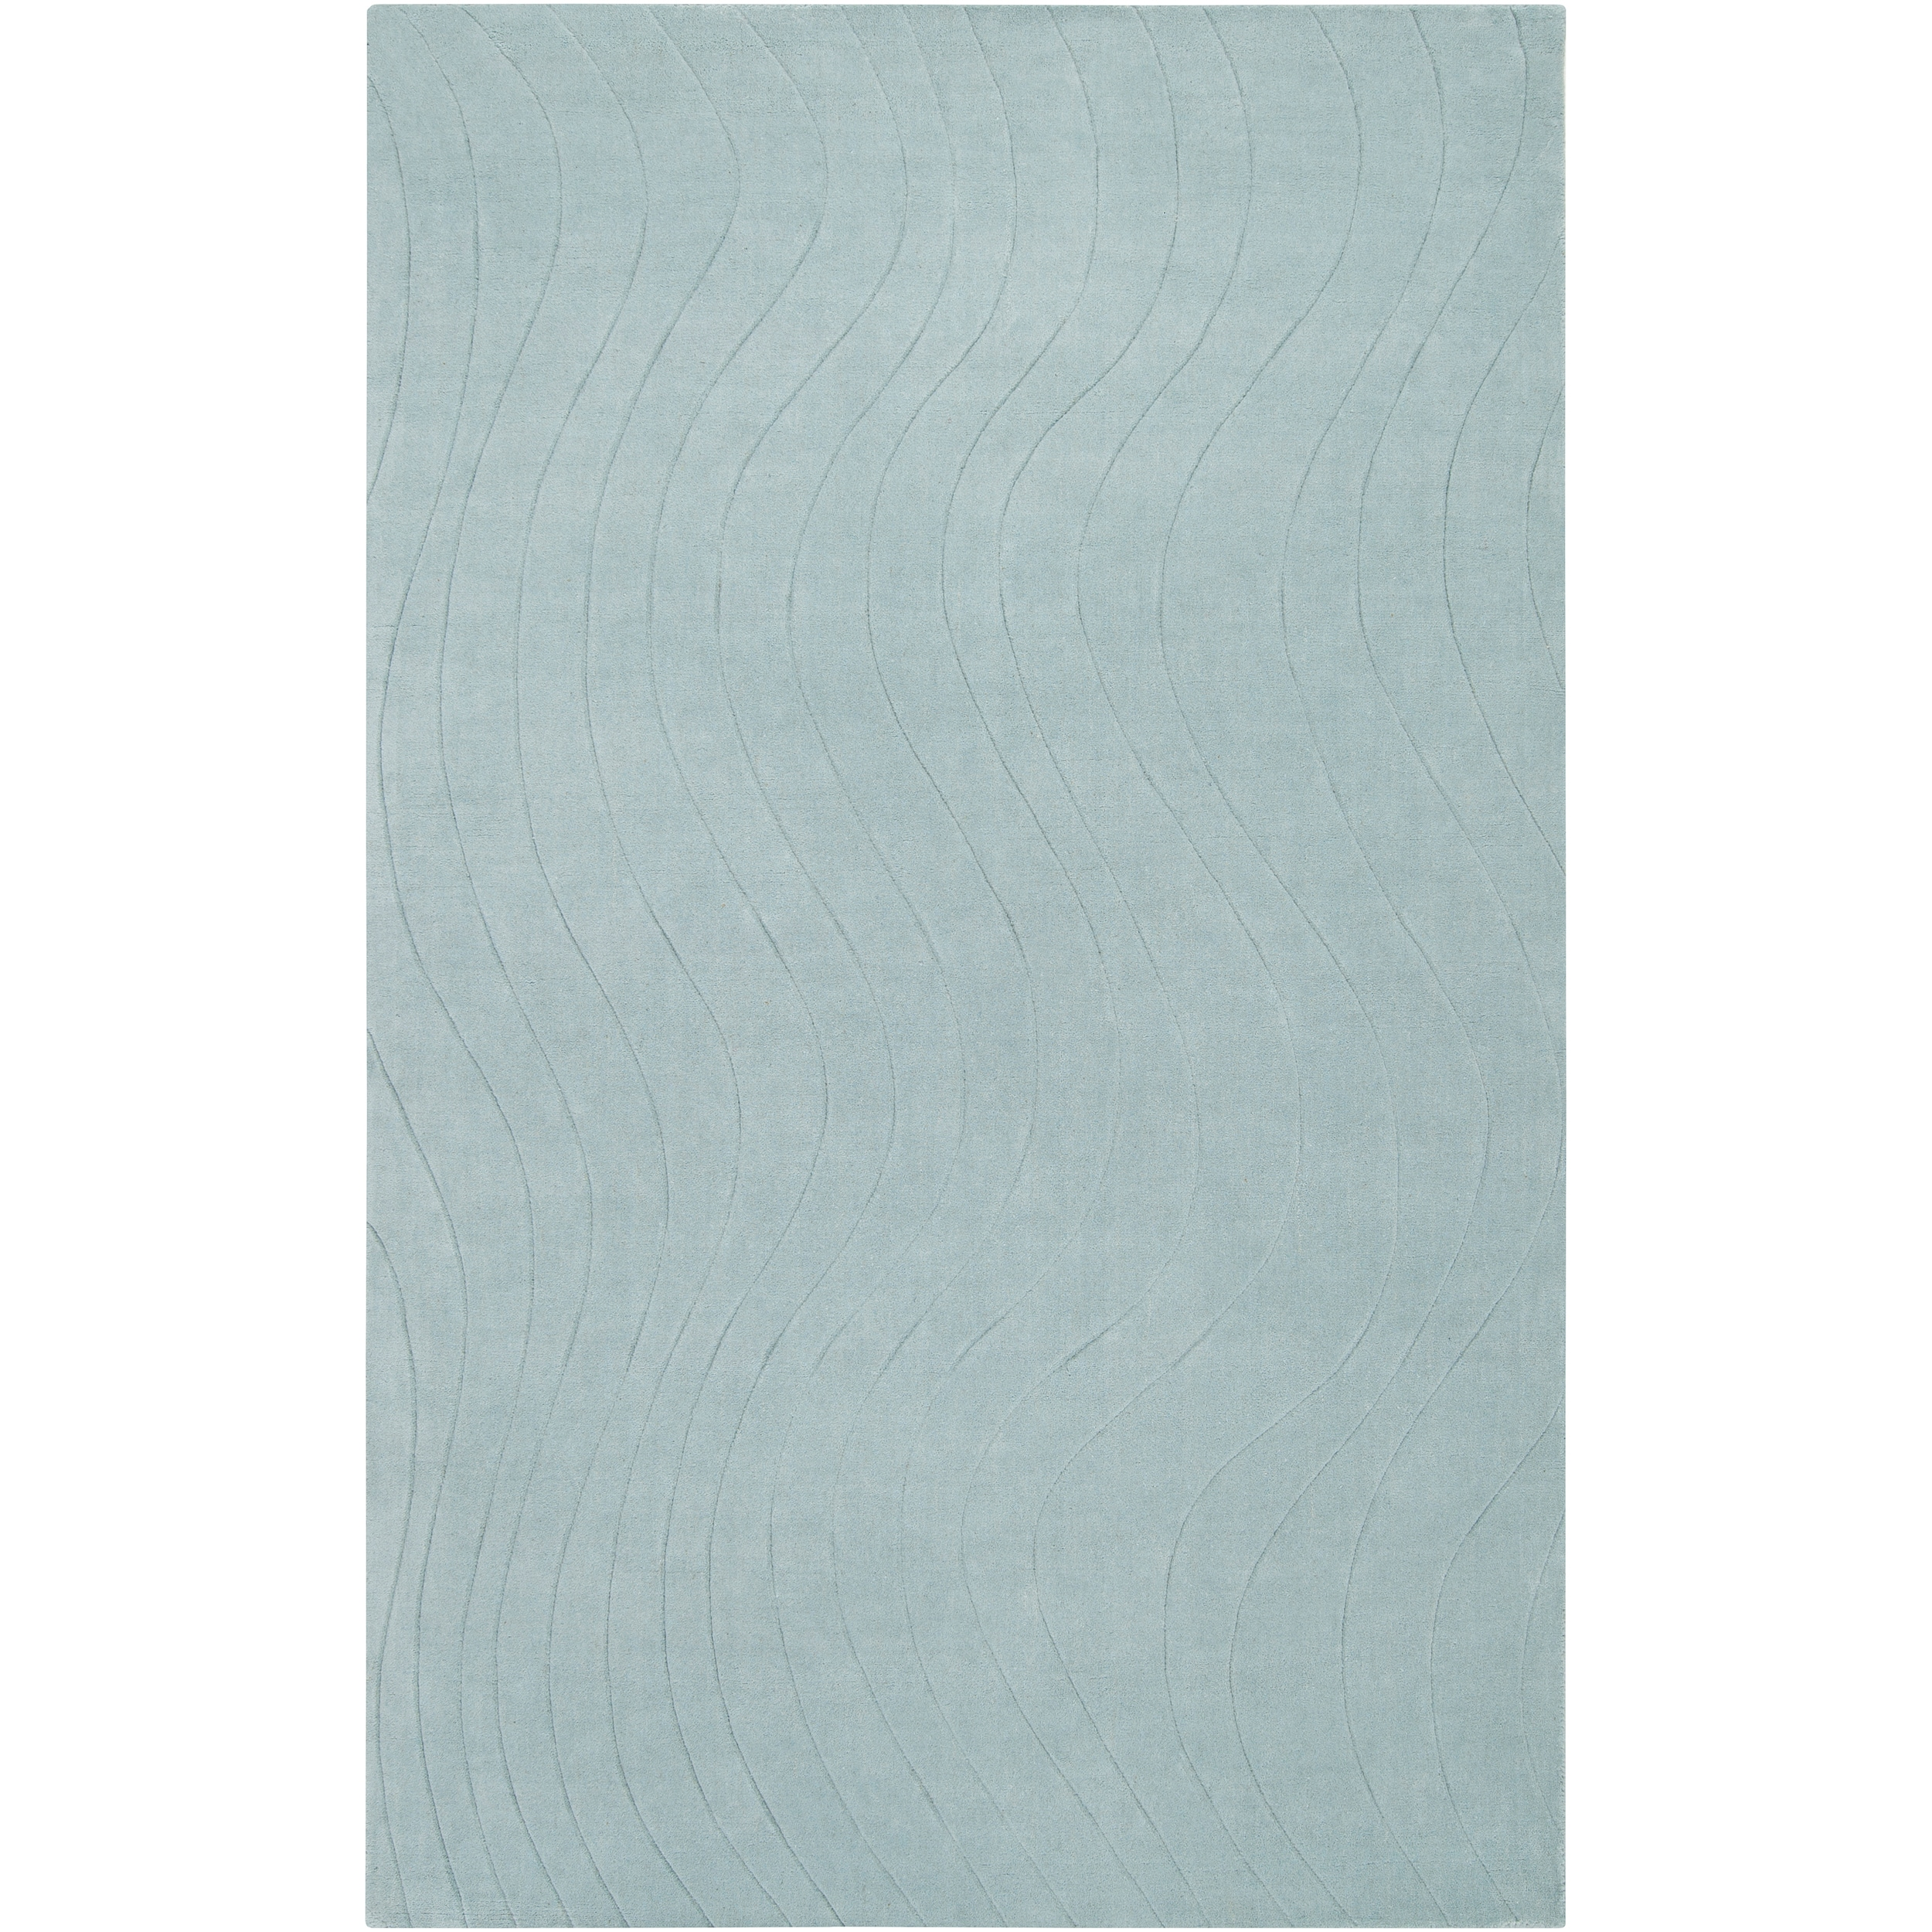 Somerset Bay Loomed Blue South Hampton Geometric Waves Wool Rug (3'3 x 5'3)